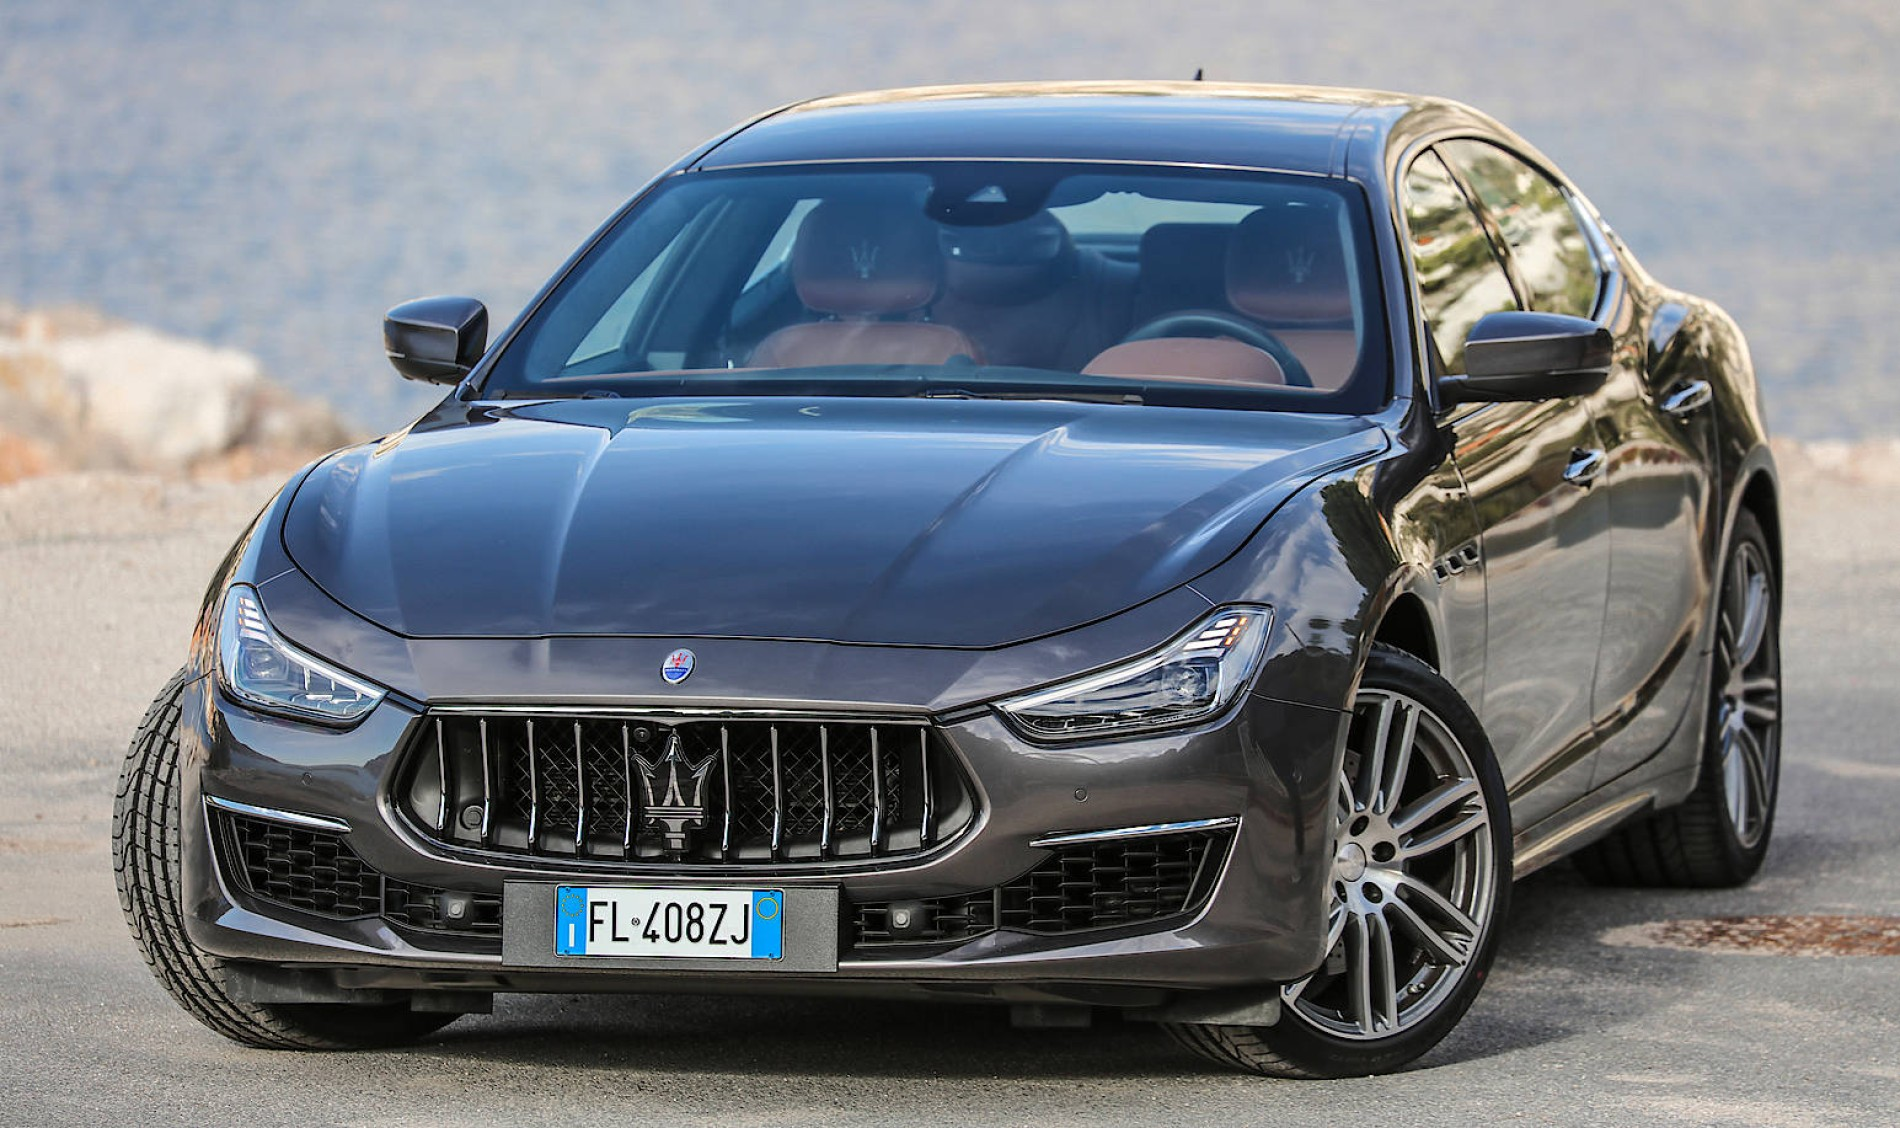 Der neue Maserati Ghibli